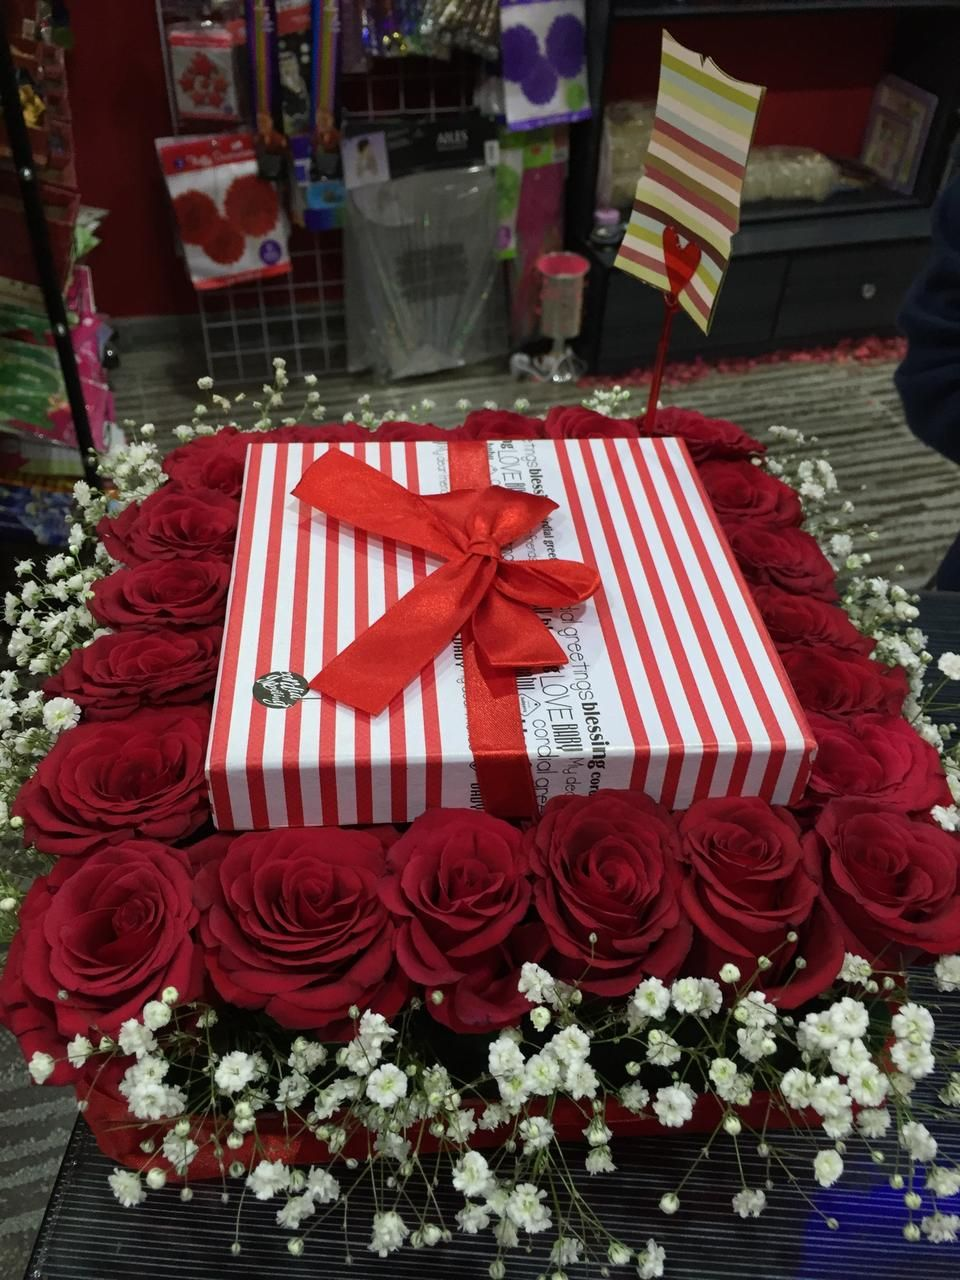 ورد الشوق Flower Shop Flower Shop Gift Wrapping Rose